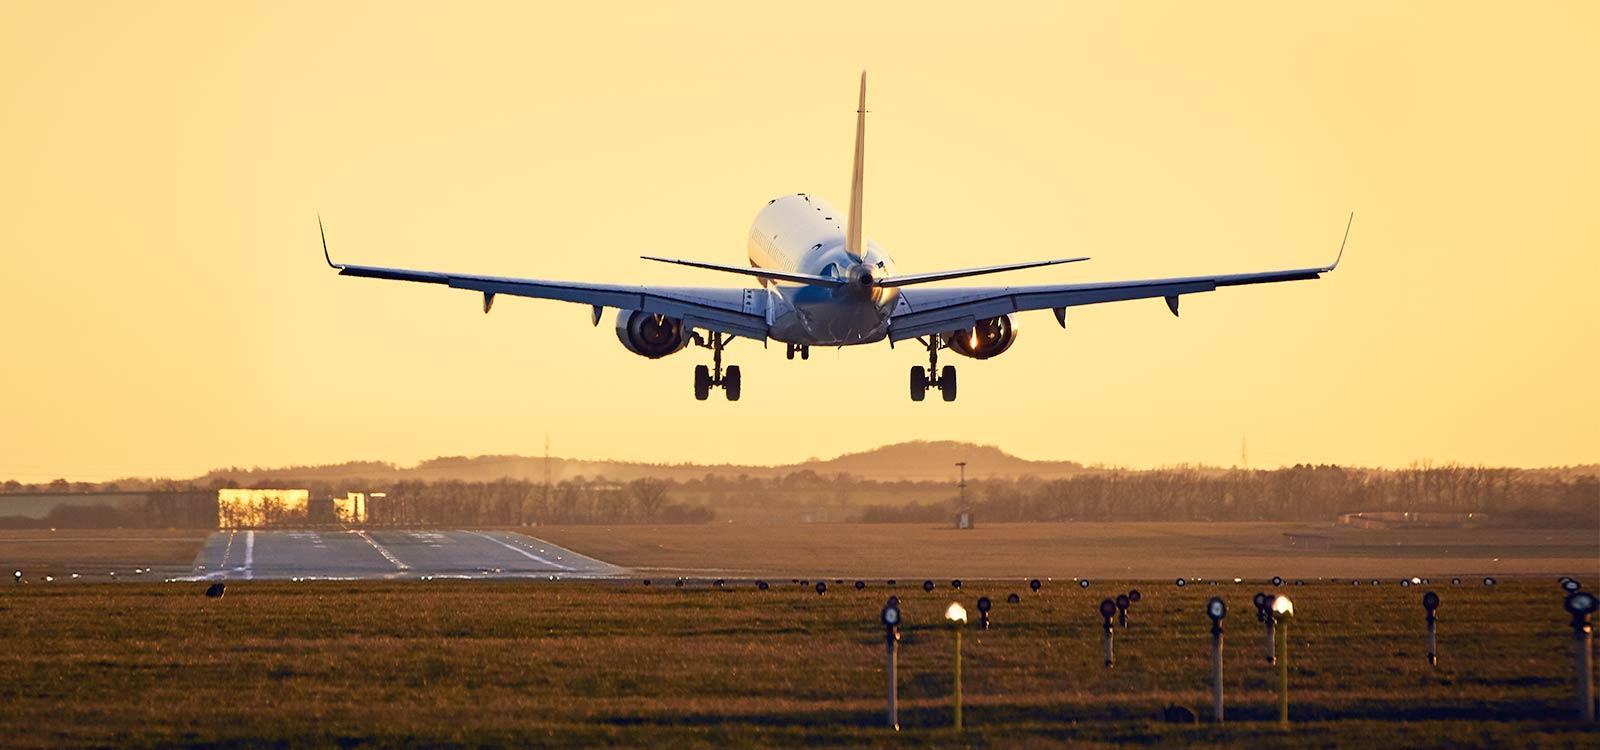 Quick-Guide zur perfekten Landingpage